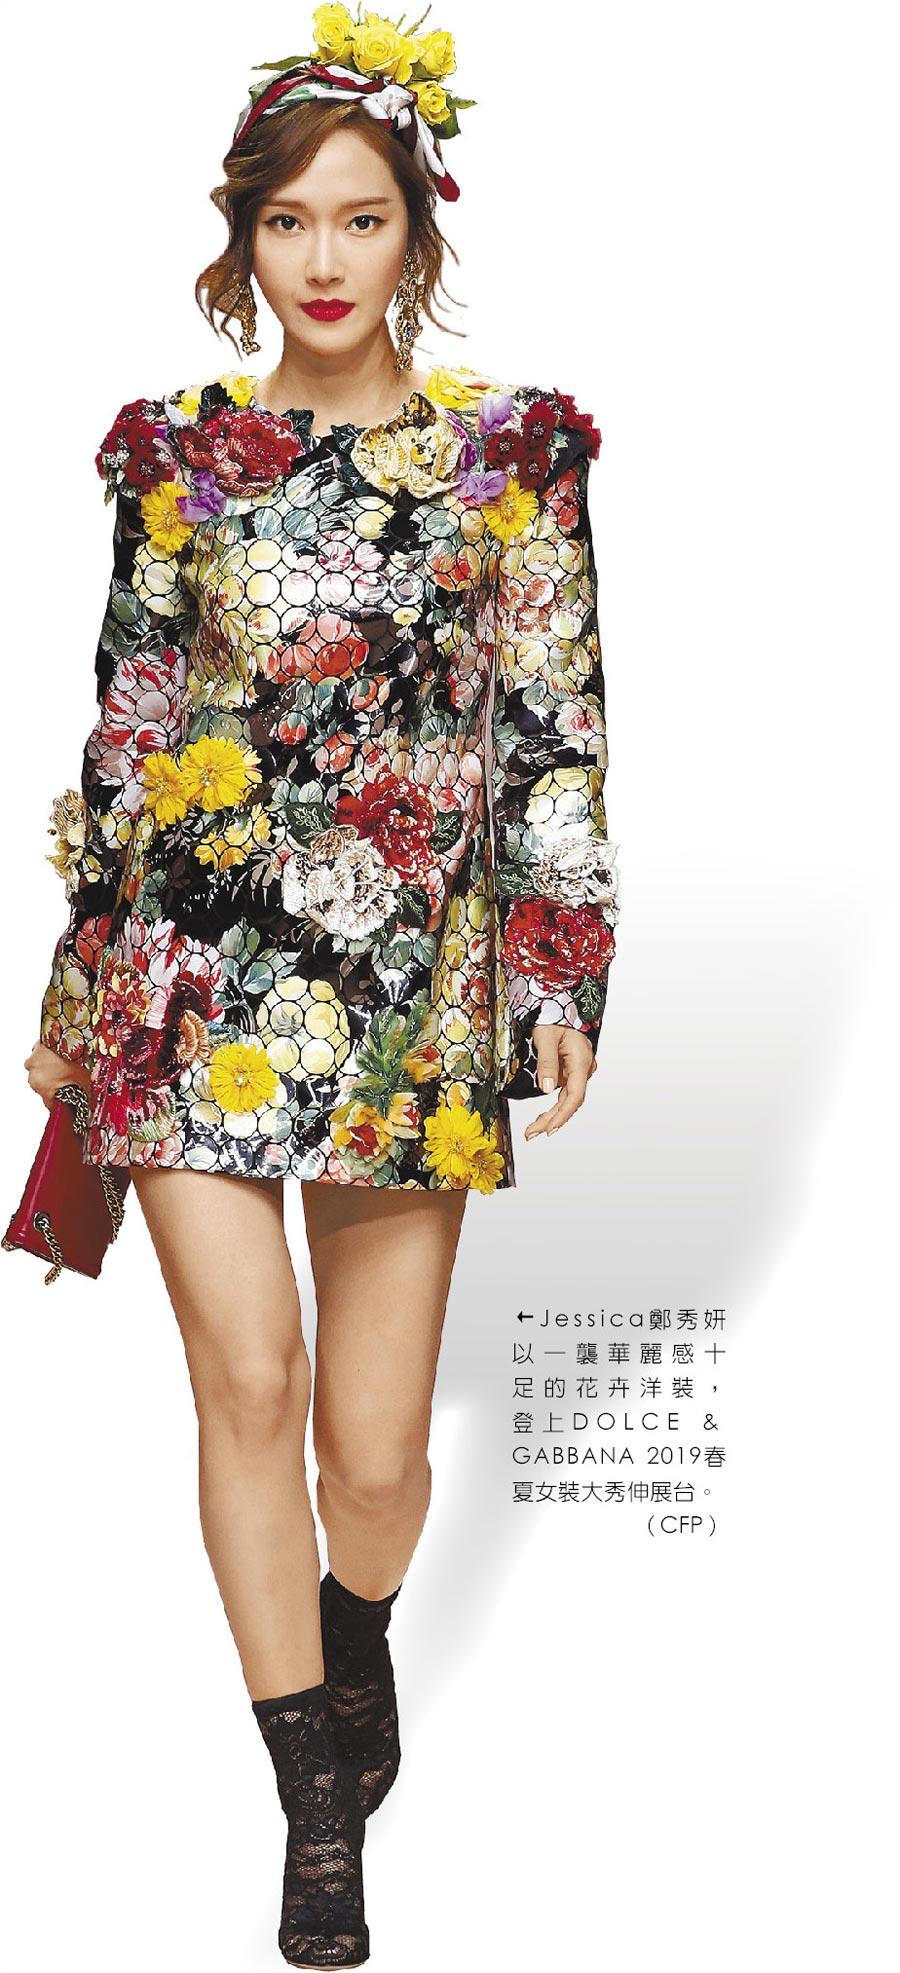 Jessica鄭秀妍以一襲華麗感十足的花卉洋裝,登上DOLCE & GABBANA 2019春夏女裝大秀伸展台。(CFP)